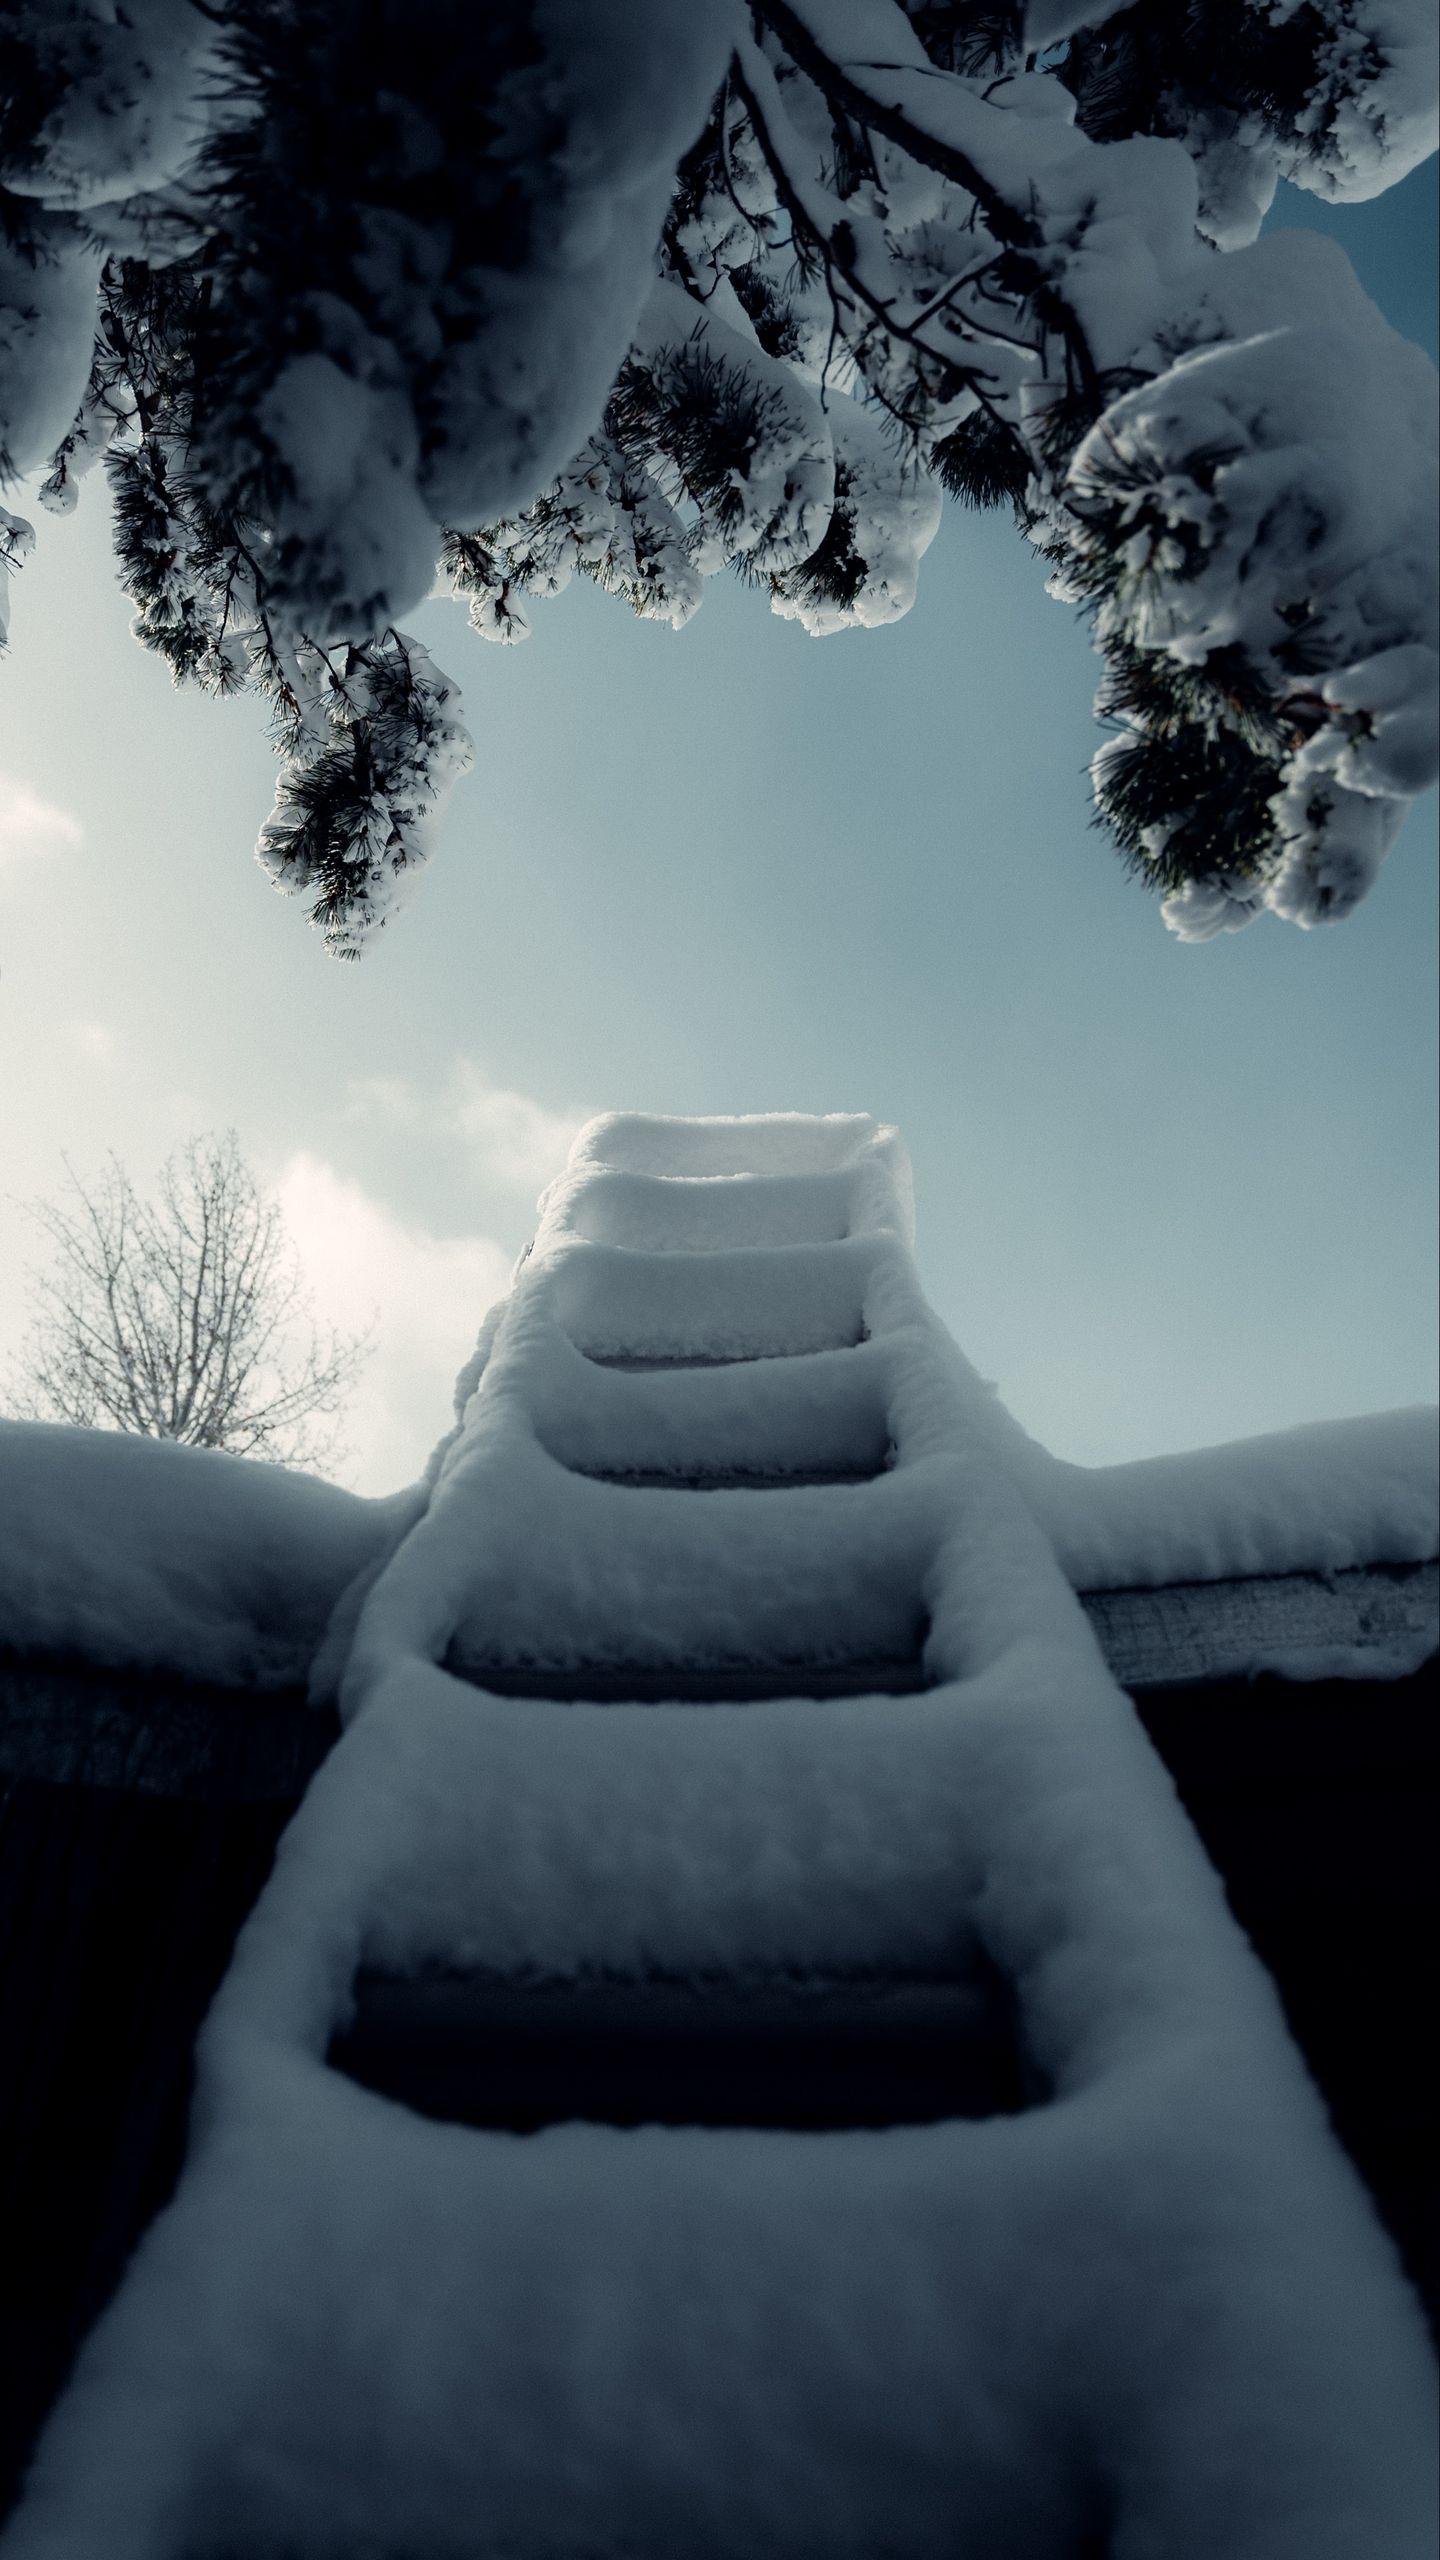 1440x2560 Wallpaper ladder, snow, branch, winter